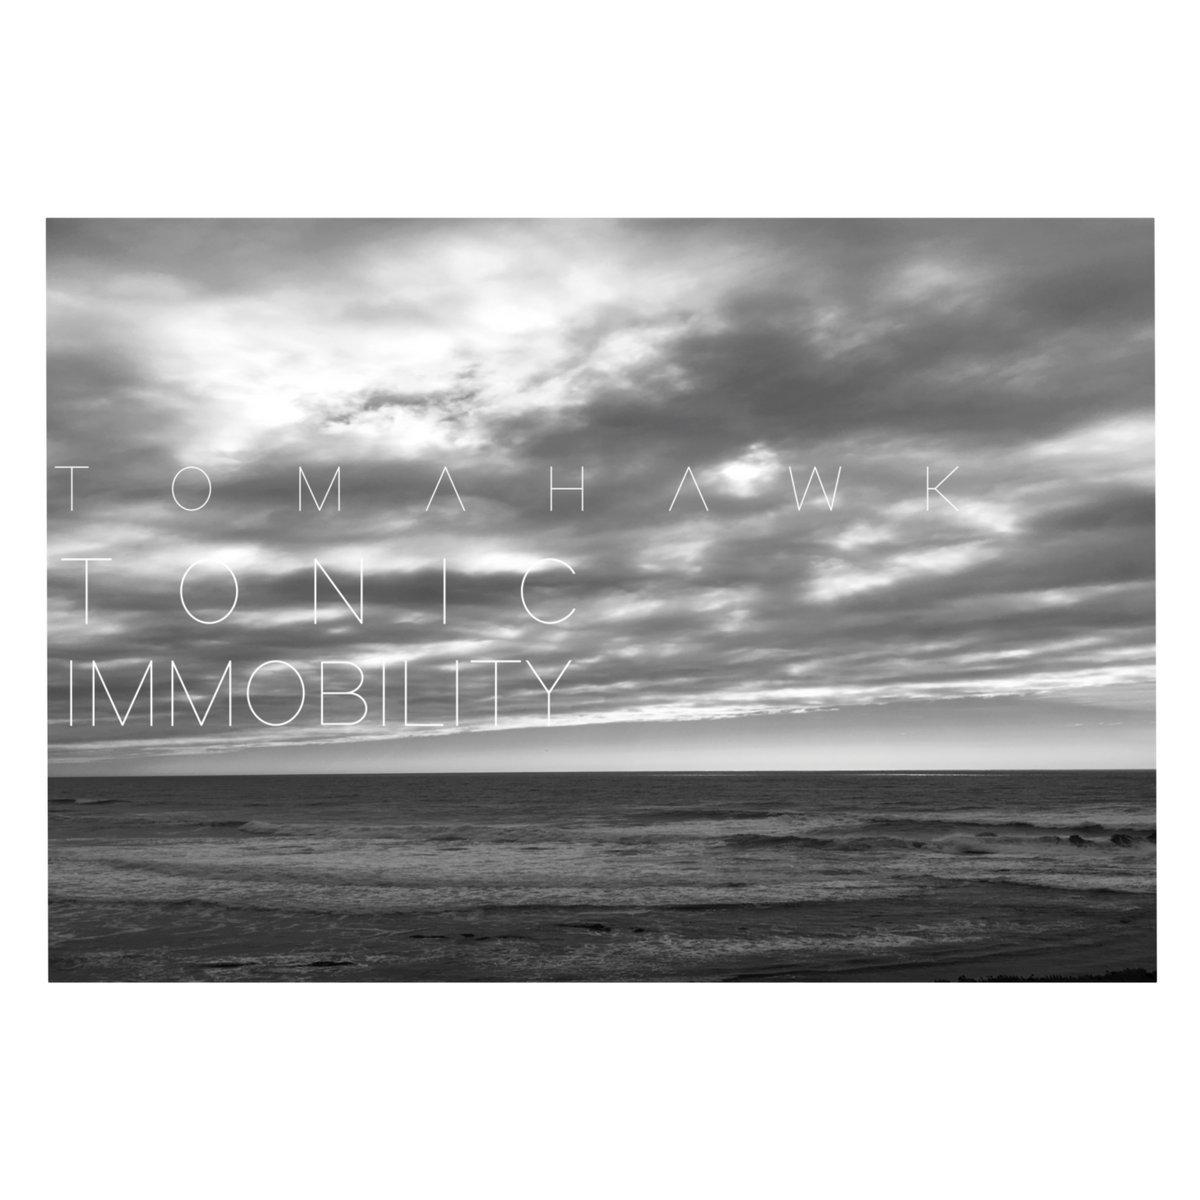 Tomahawk - Tonic Immobility [LTD LP] (Coke Bottle Clear Vinyl)